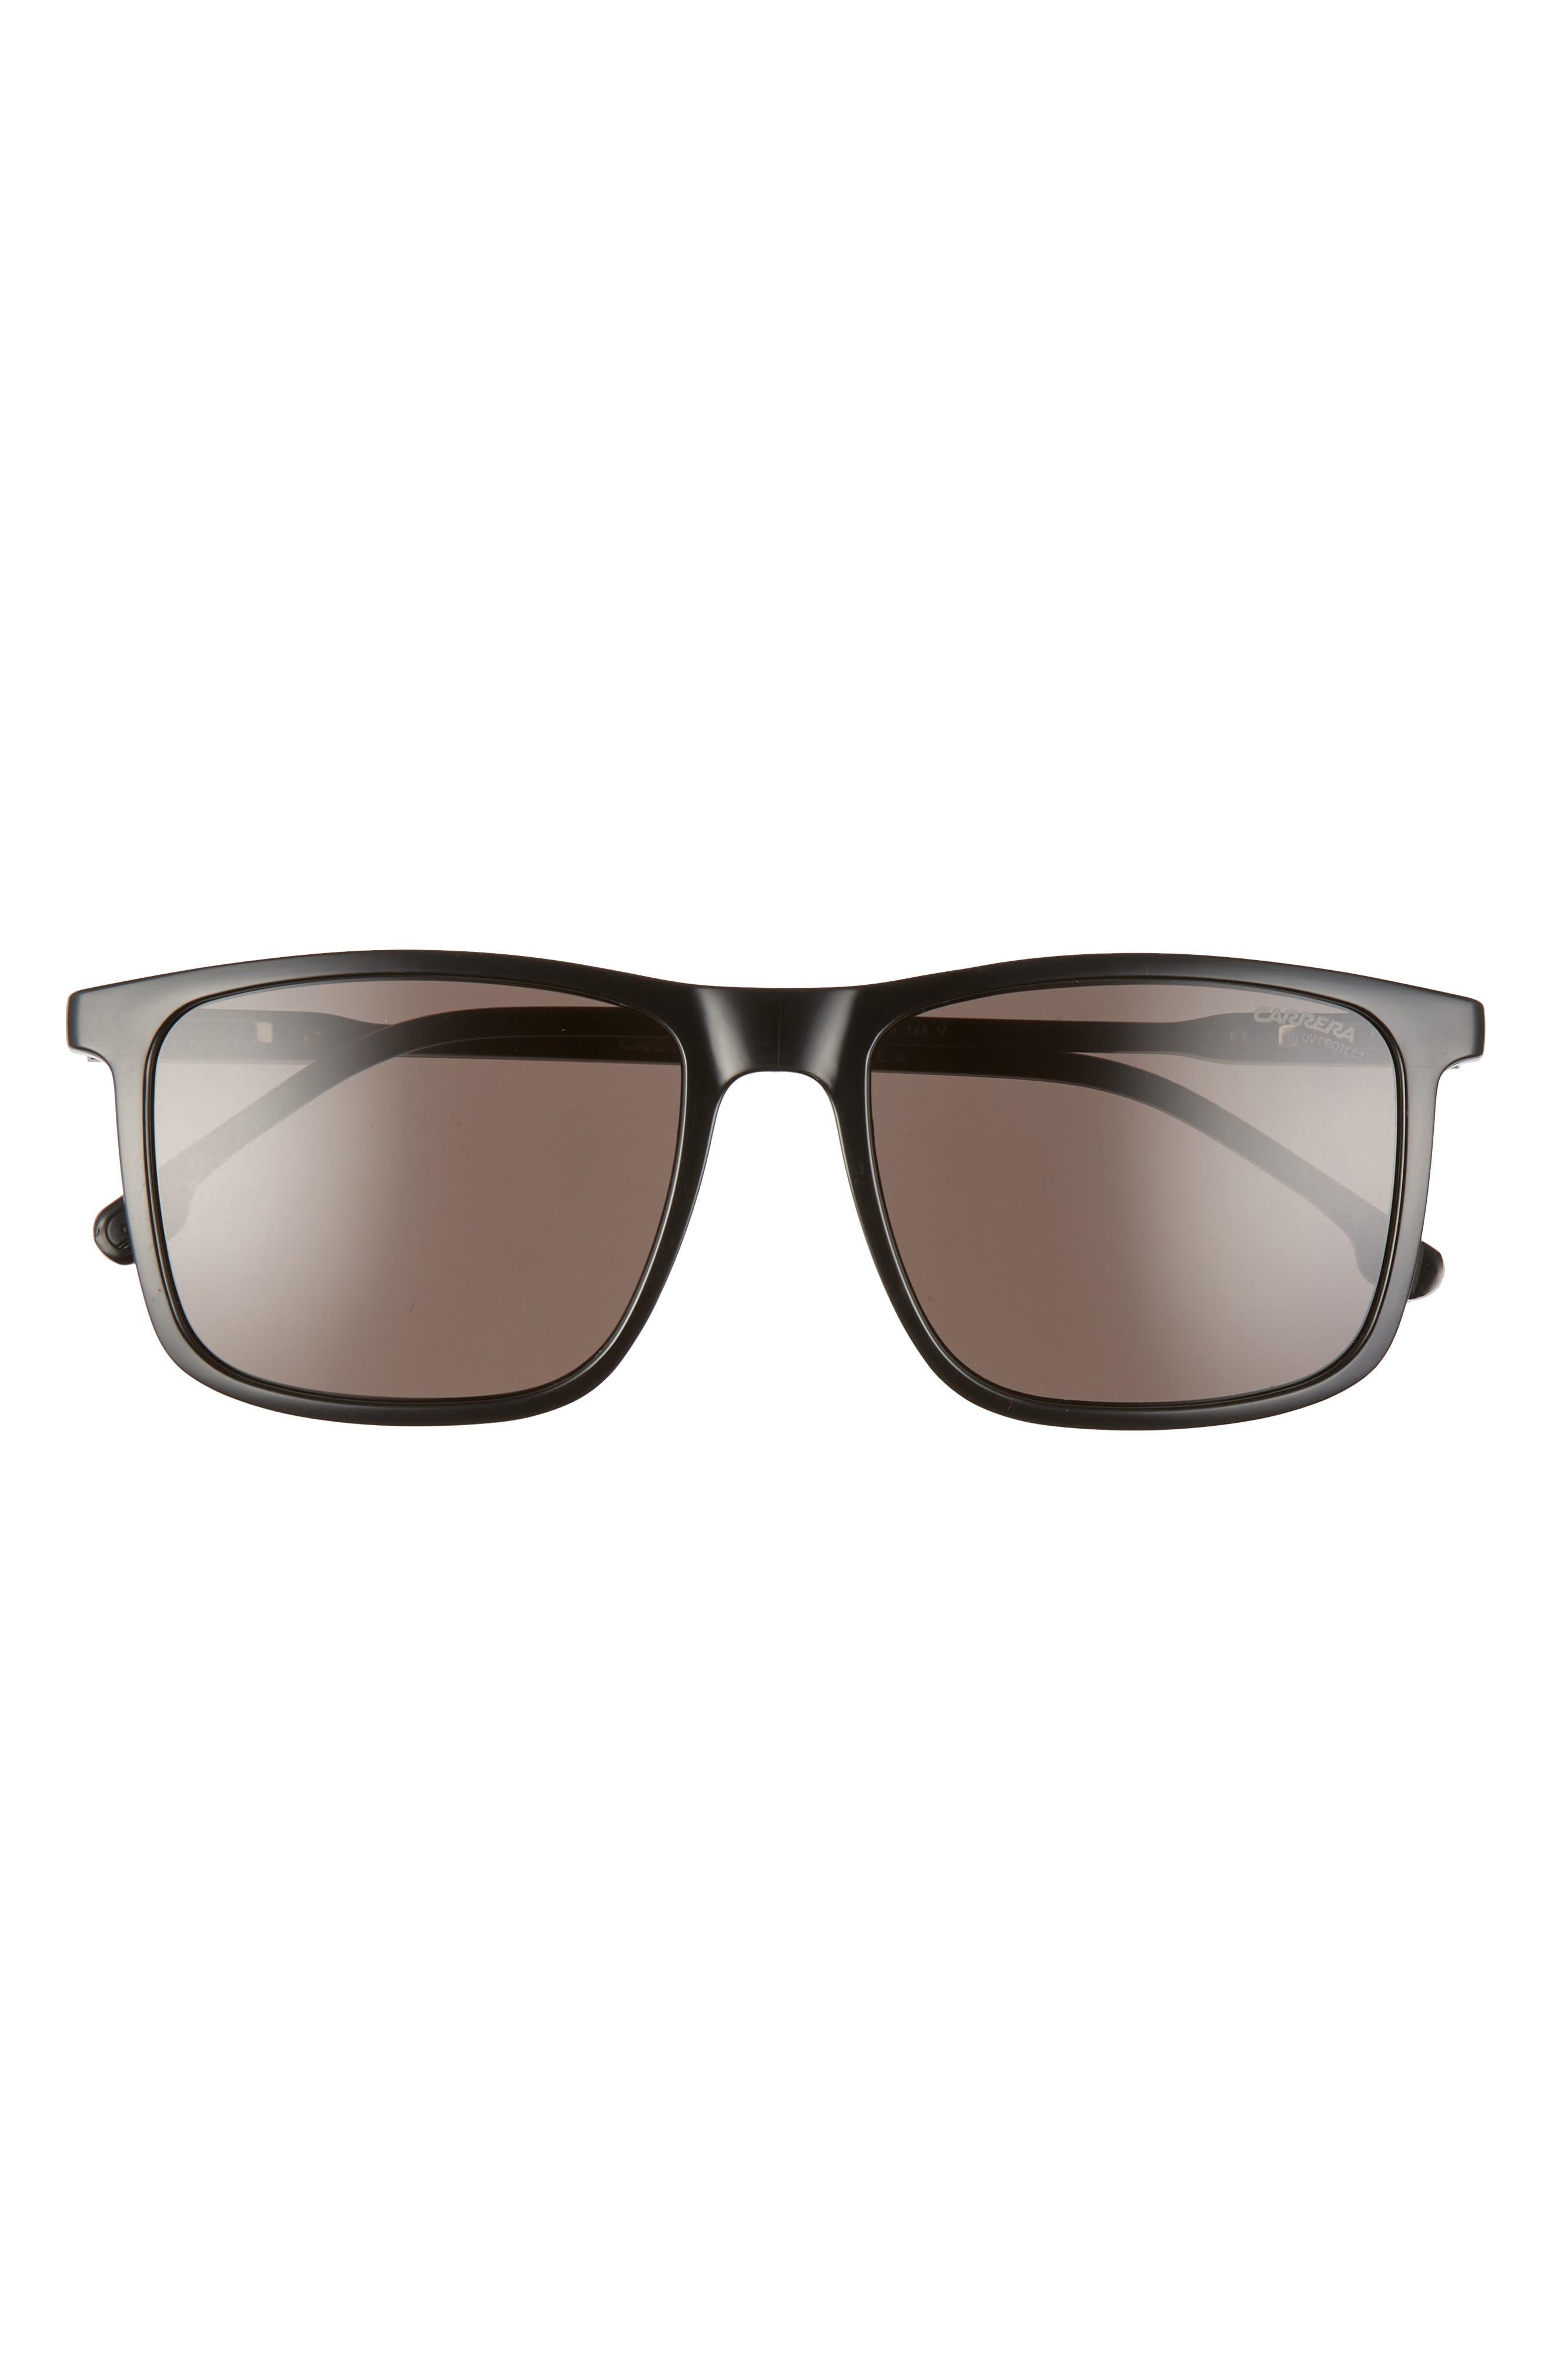 55mm Rectangular Polarized Sunglasses